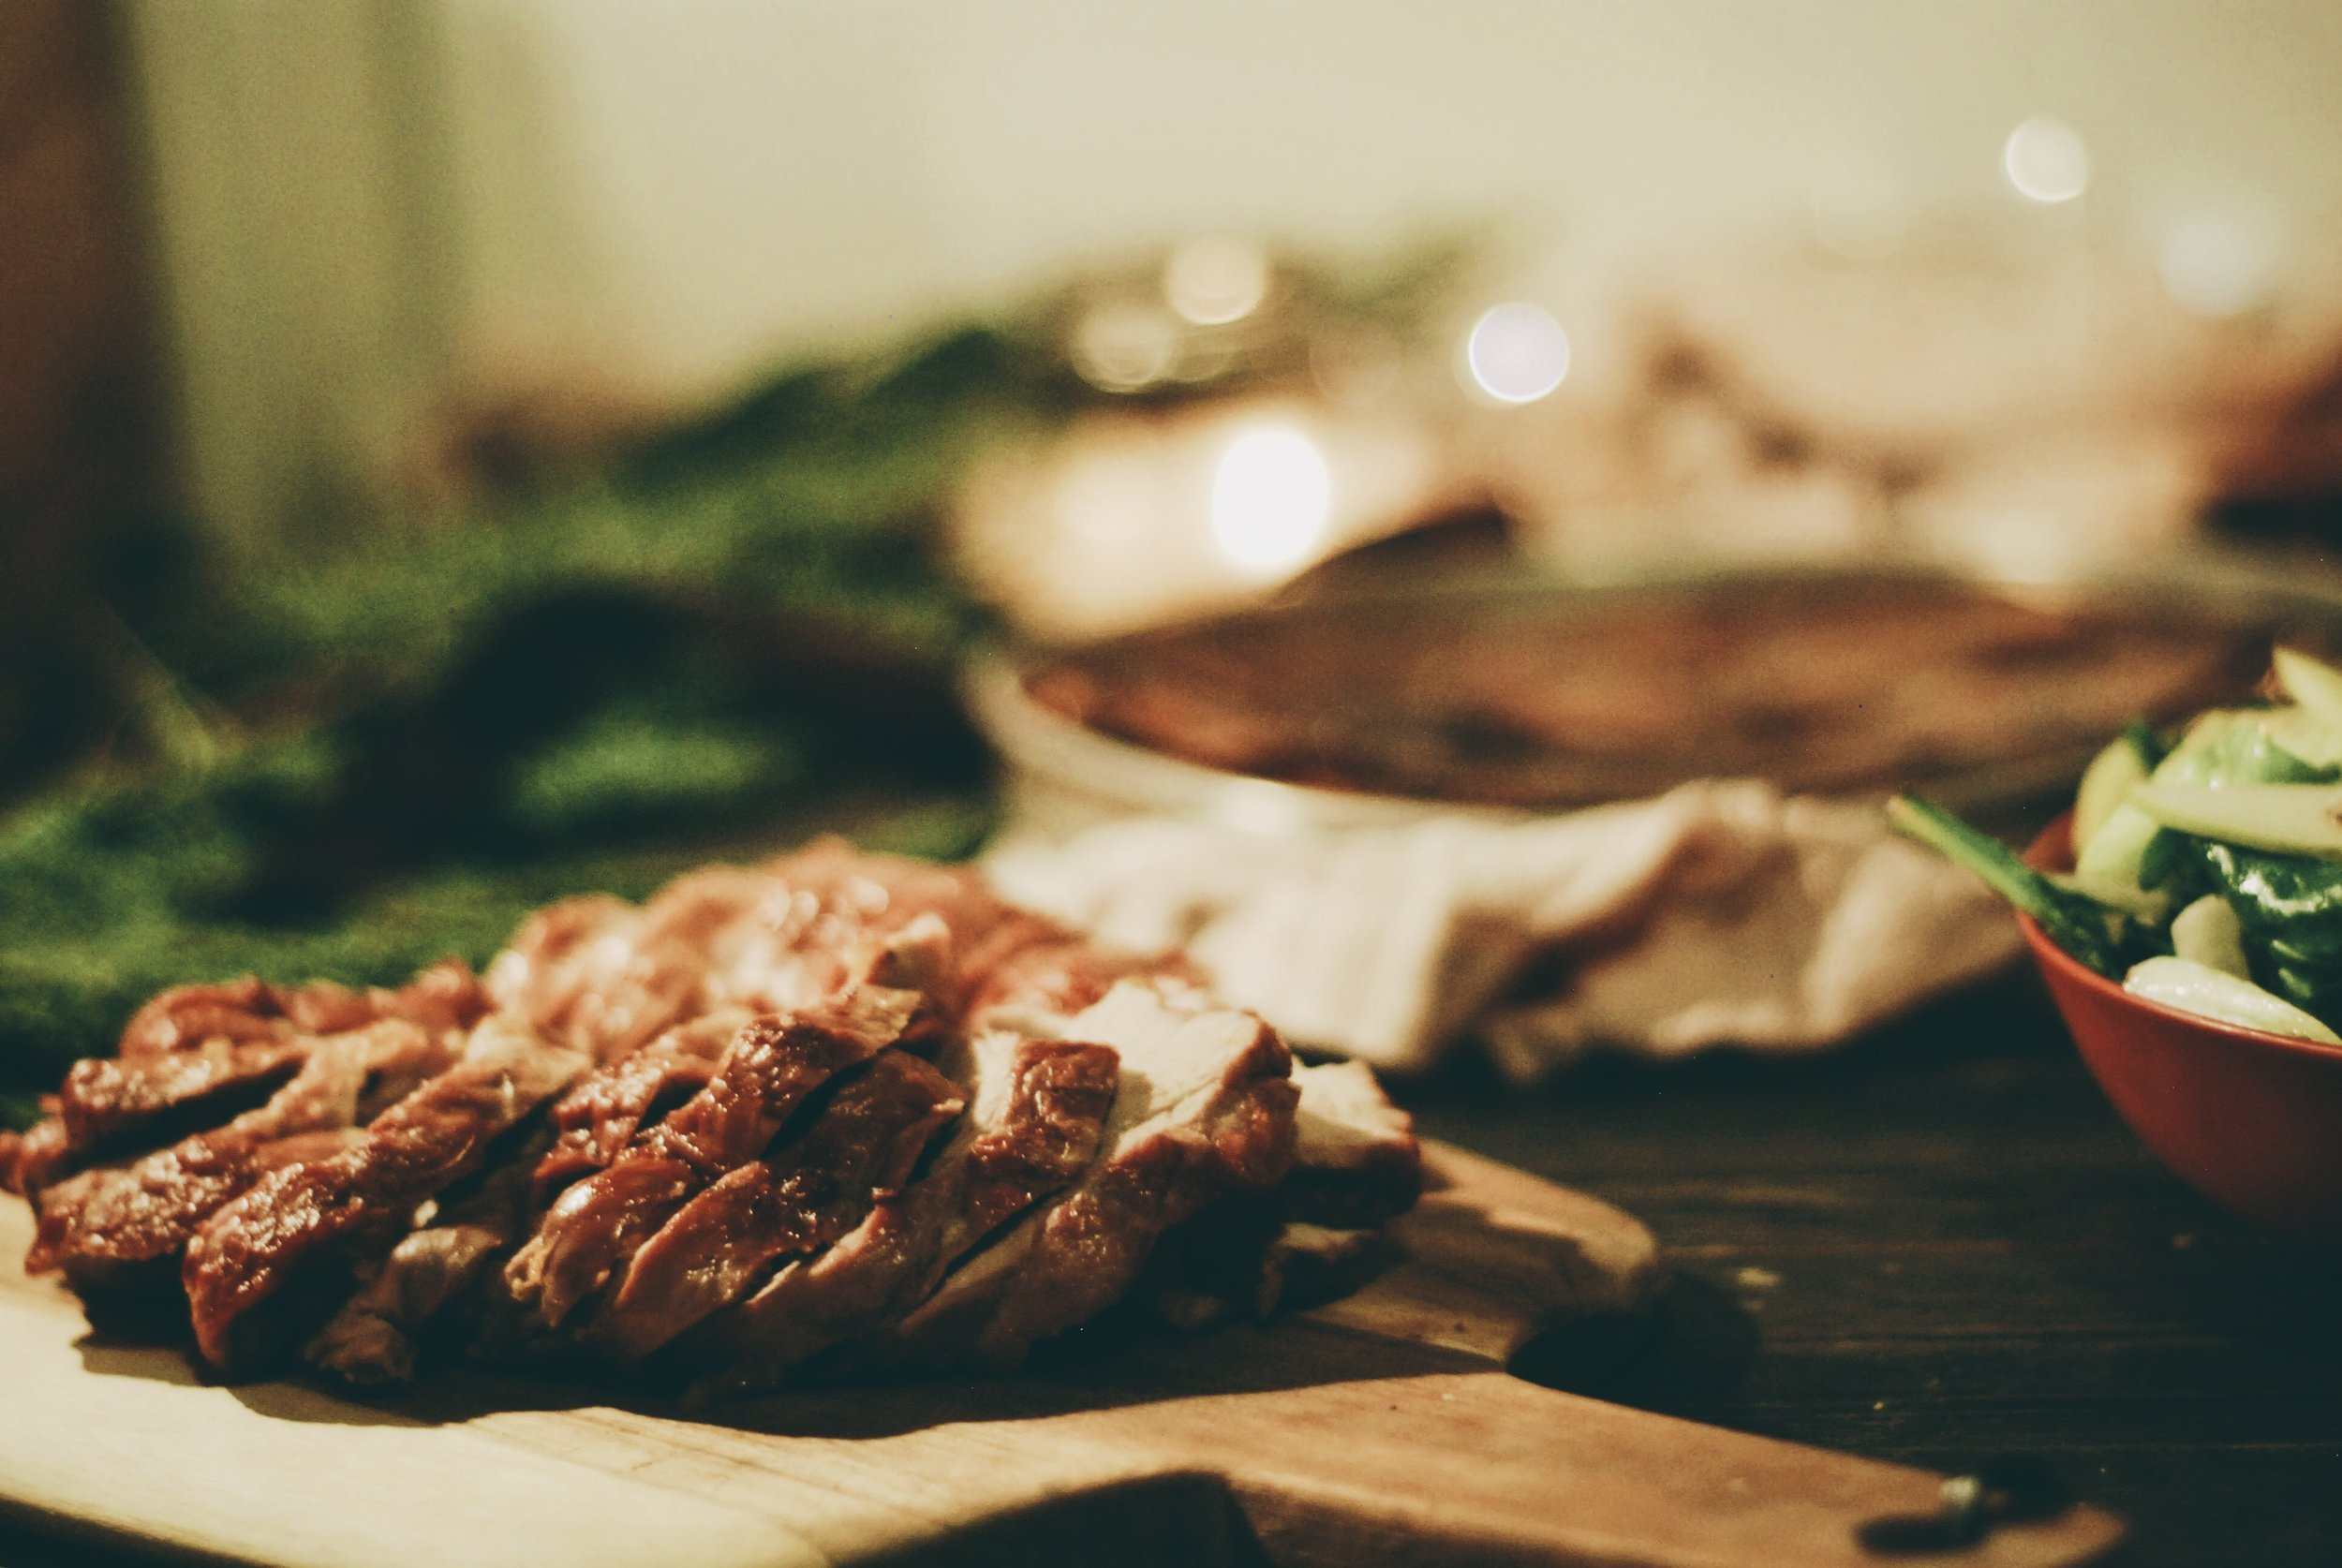 A Festive Friendship Feast for the holidays- apricot stuffed pork